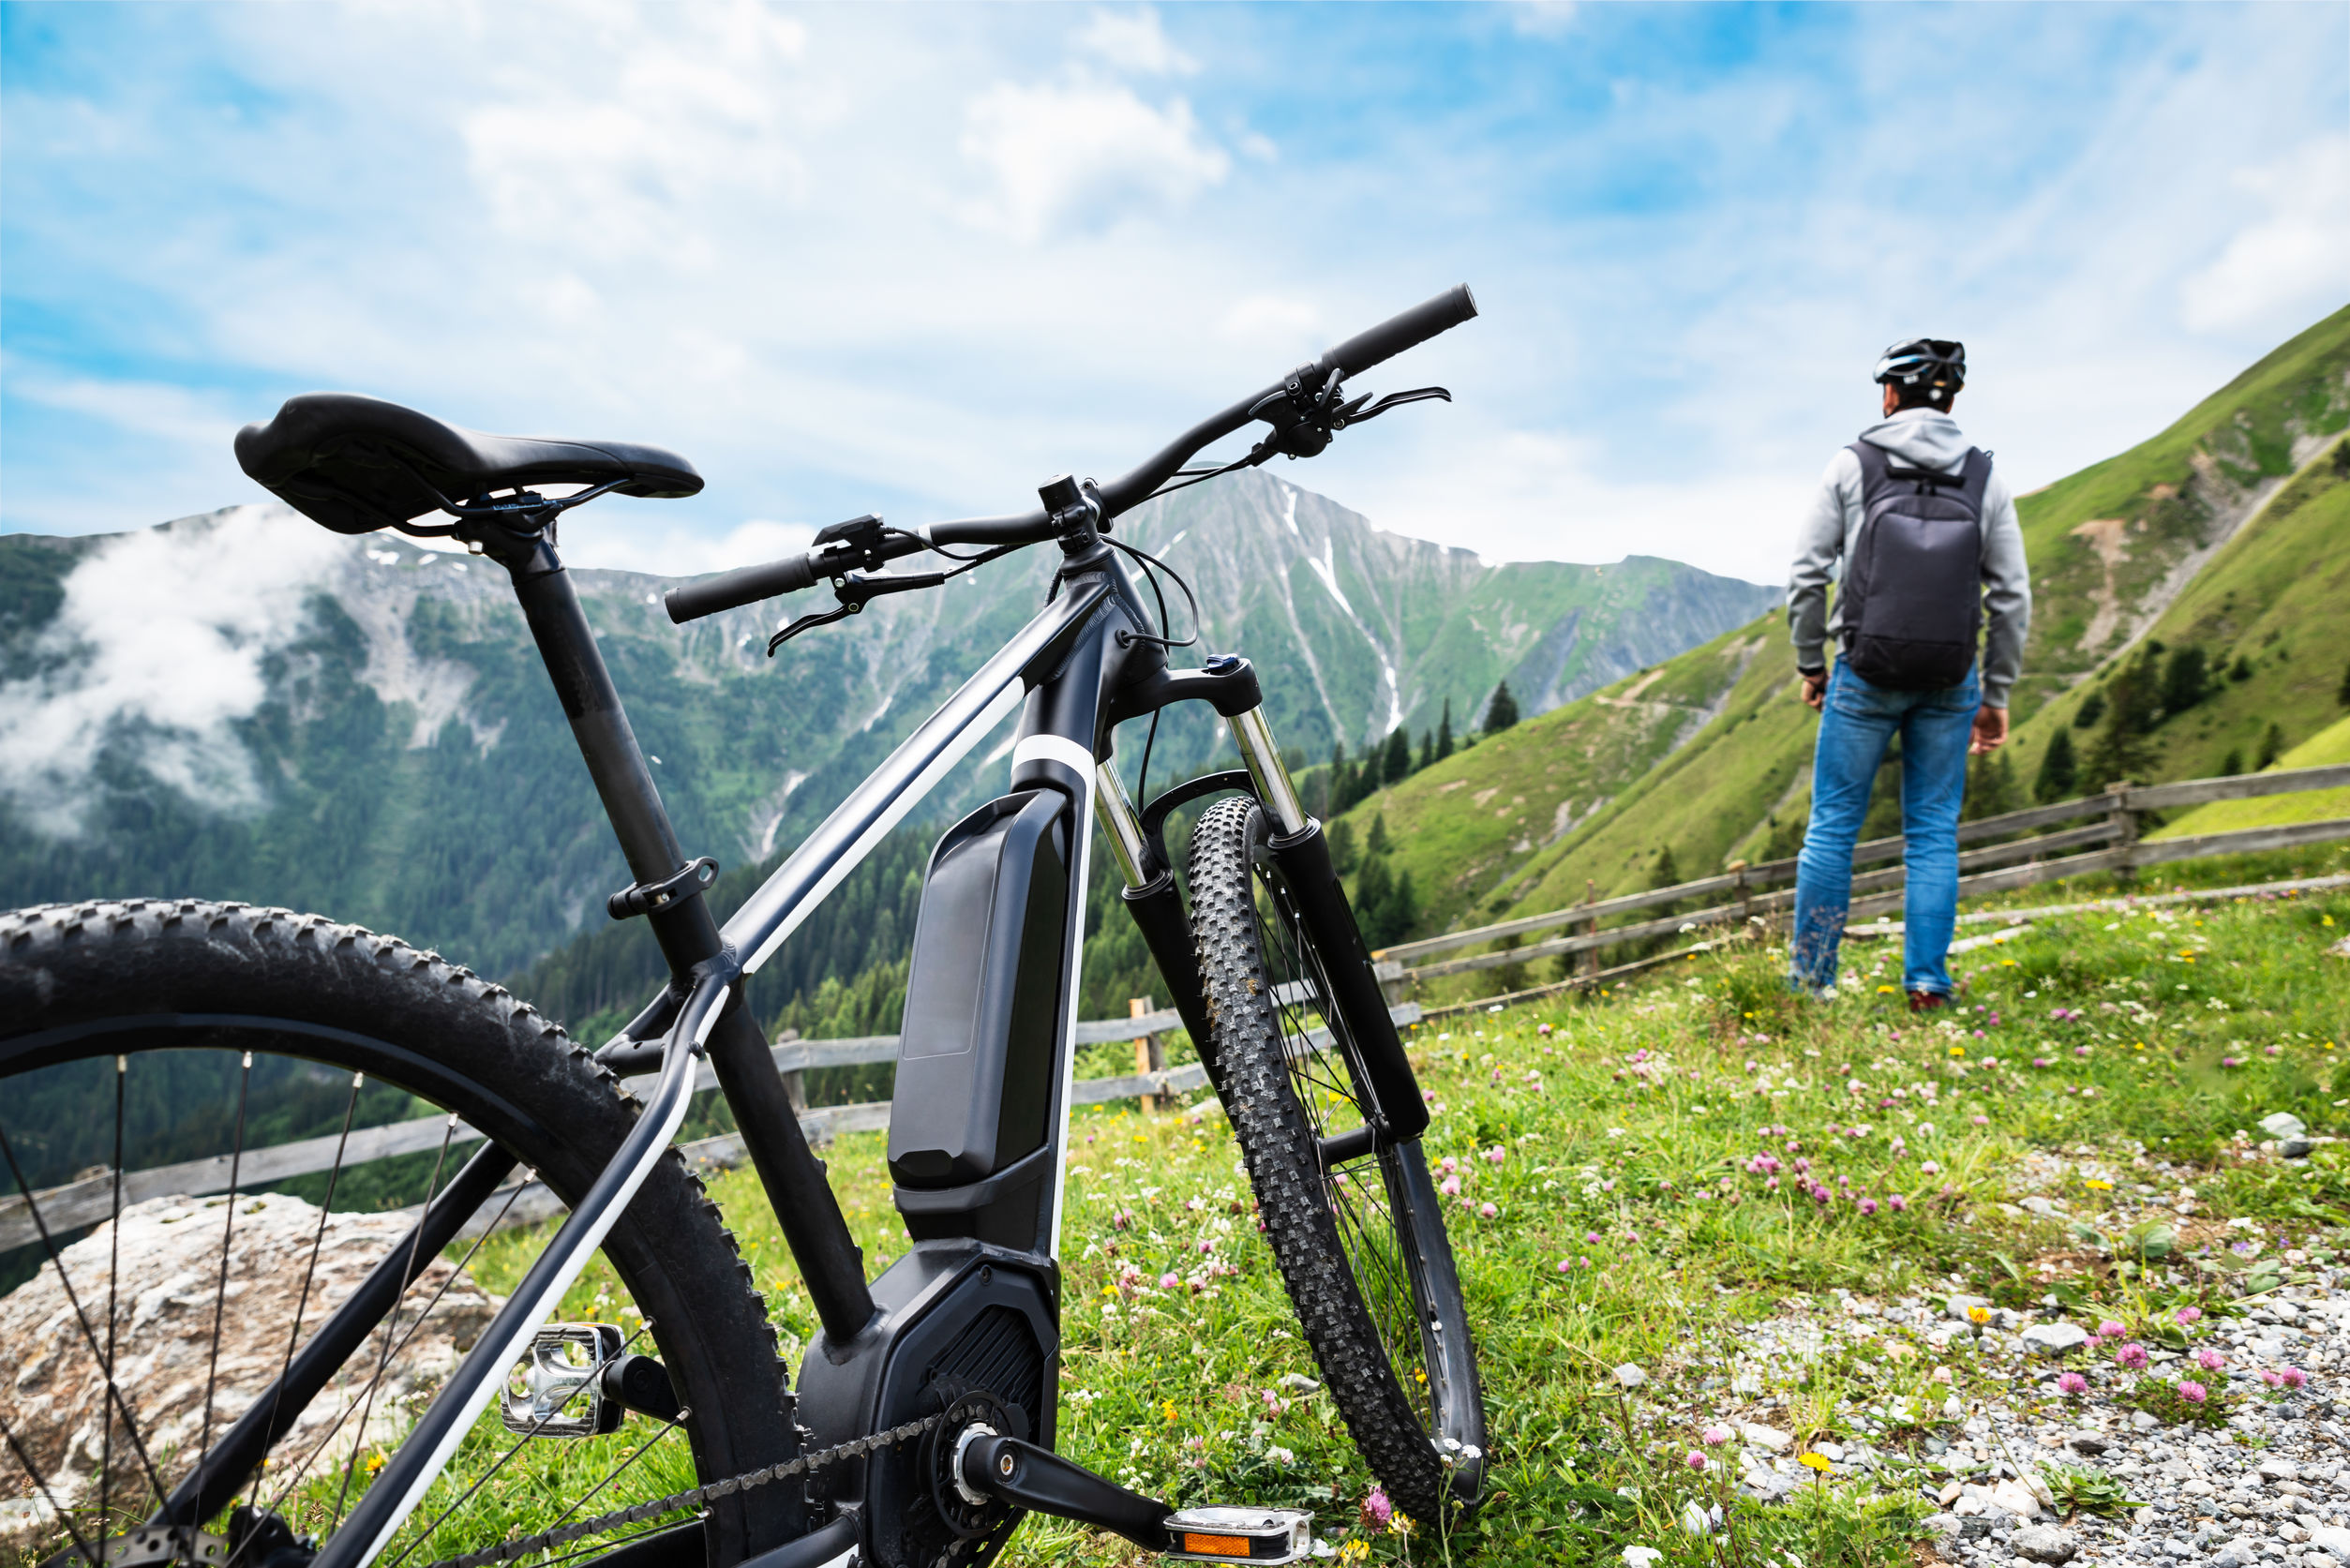 E-bike vouwfiets: test & aanbevelingen (10/21)